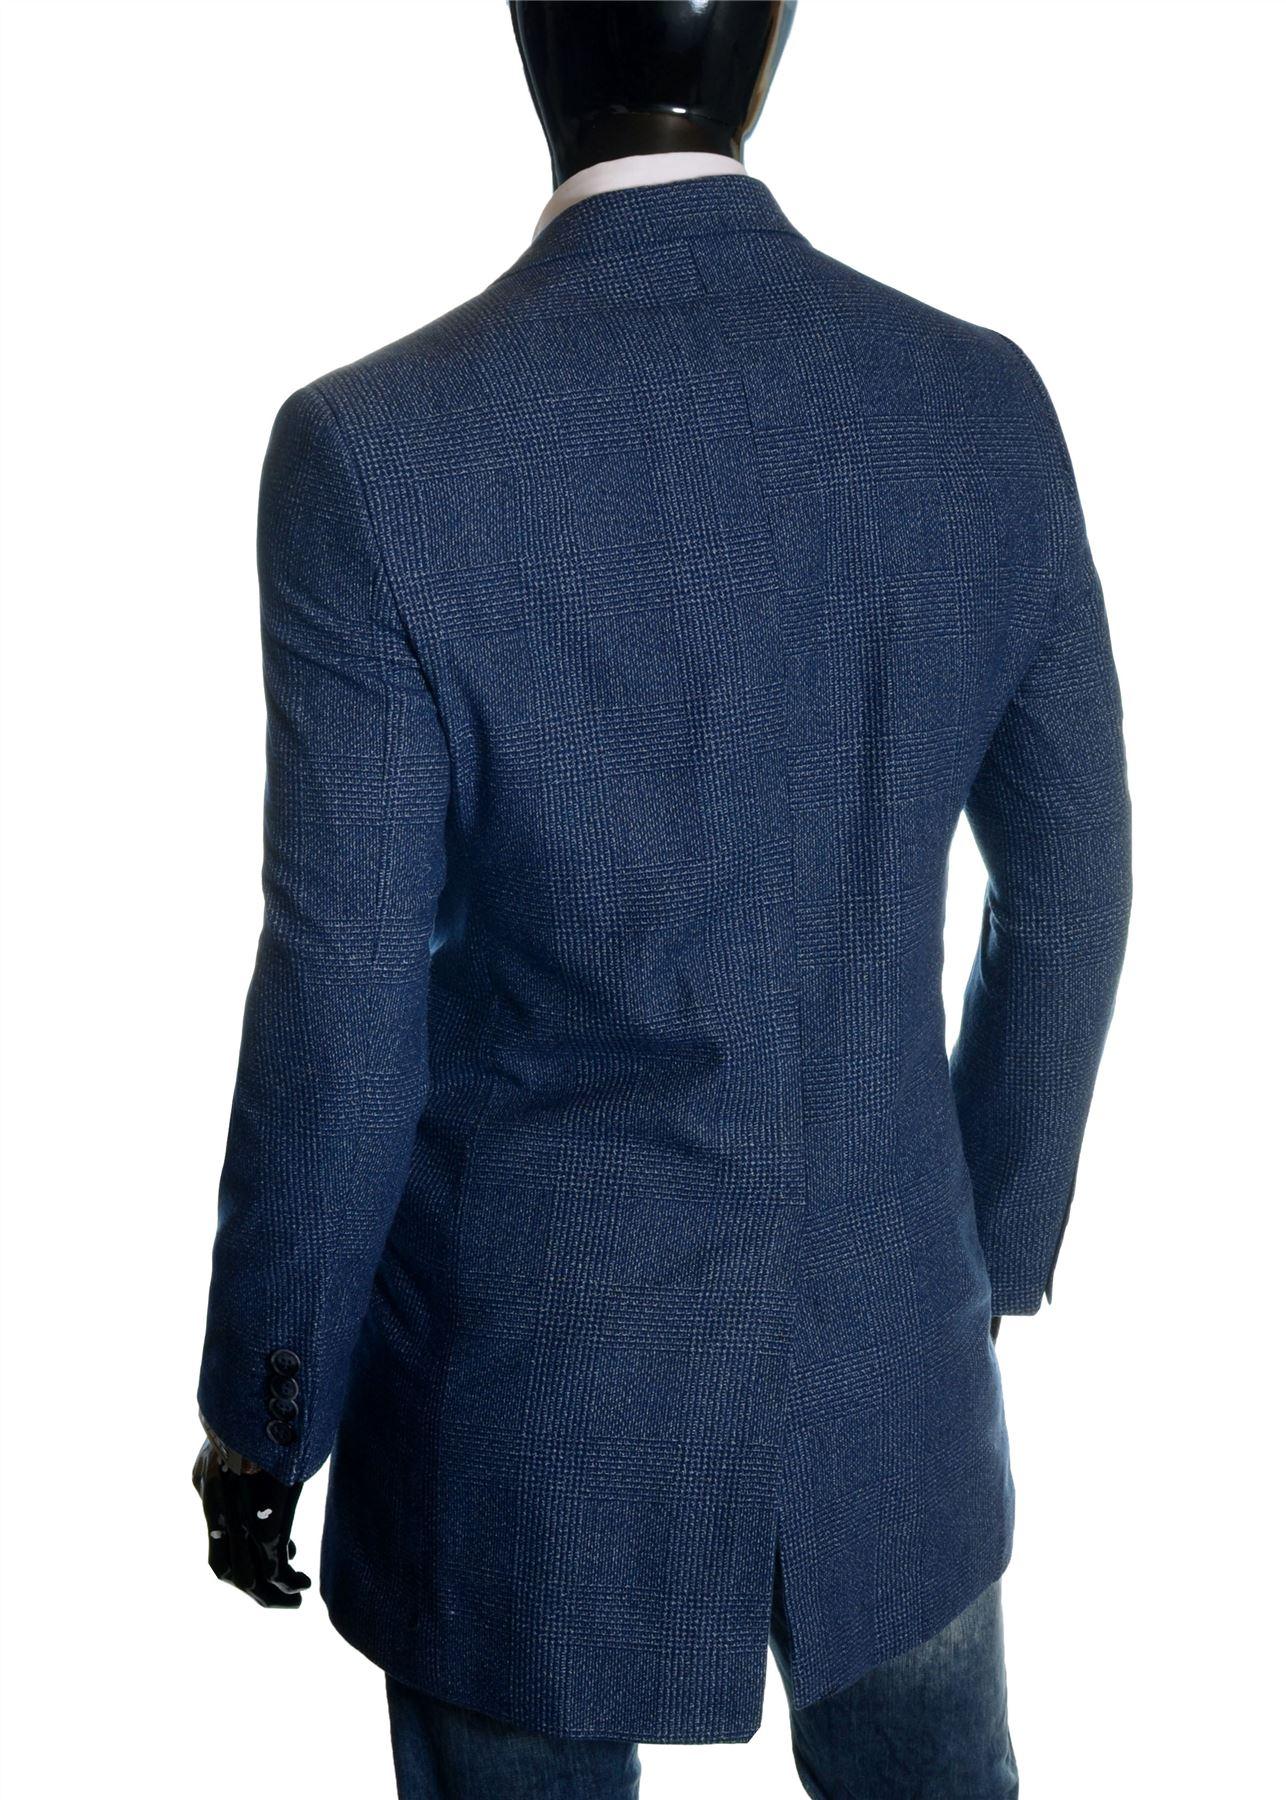 Men-039-s-Checkered-Coat-3-4-Long-Tweed-Cashmere-Wool-Trendy-Formal-Winter-Overcoat thumbnail 5